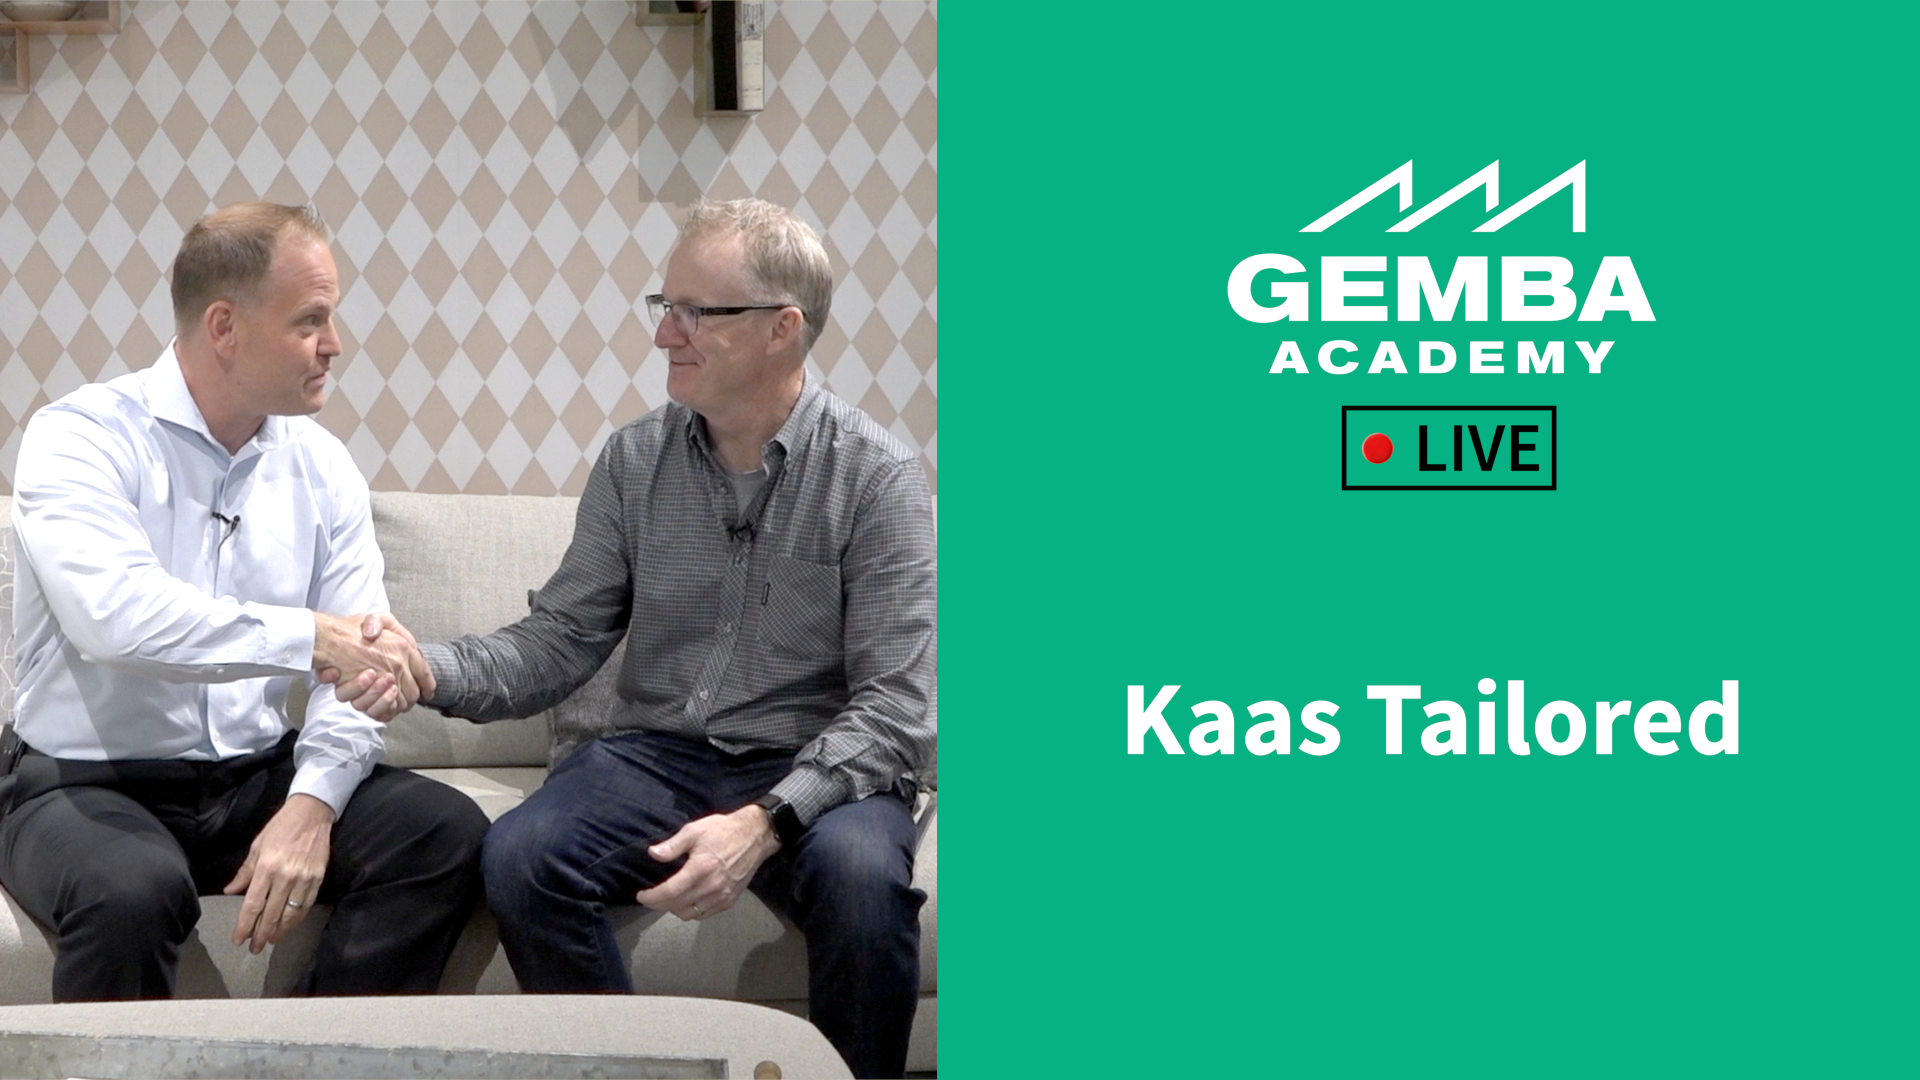 Kaas tailored new videos